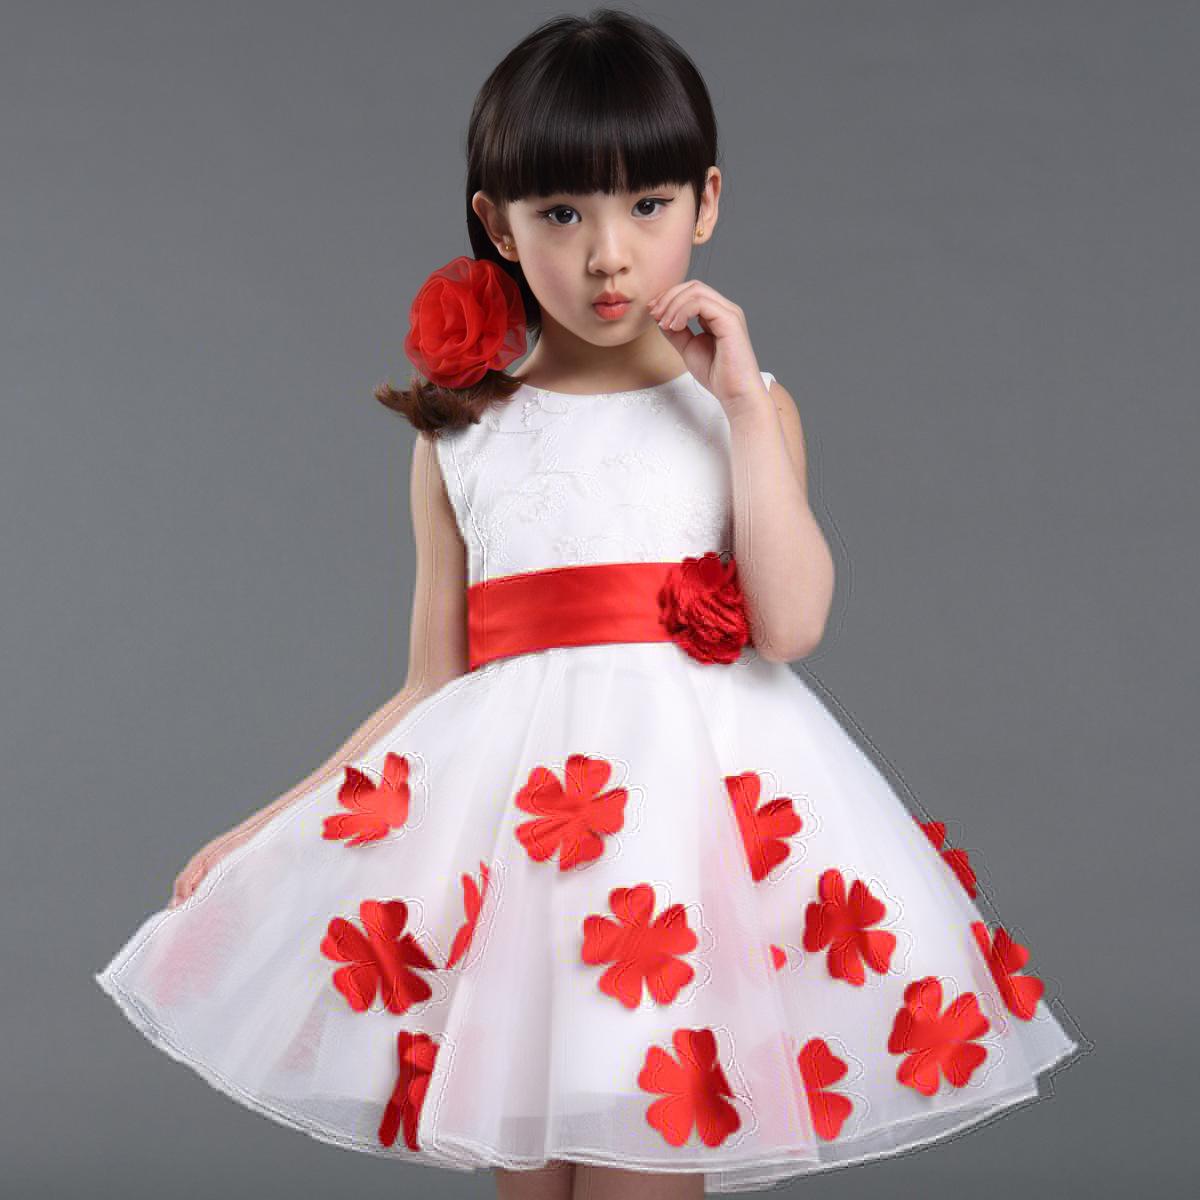 Roupas Infantis Menina 2016 New Fashion Summer Red Girl Dress Sleeveless Chiffon Flower Tutu Layered Princess Bow Kids Dresses(China (Mainland))